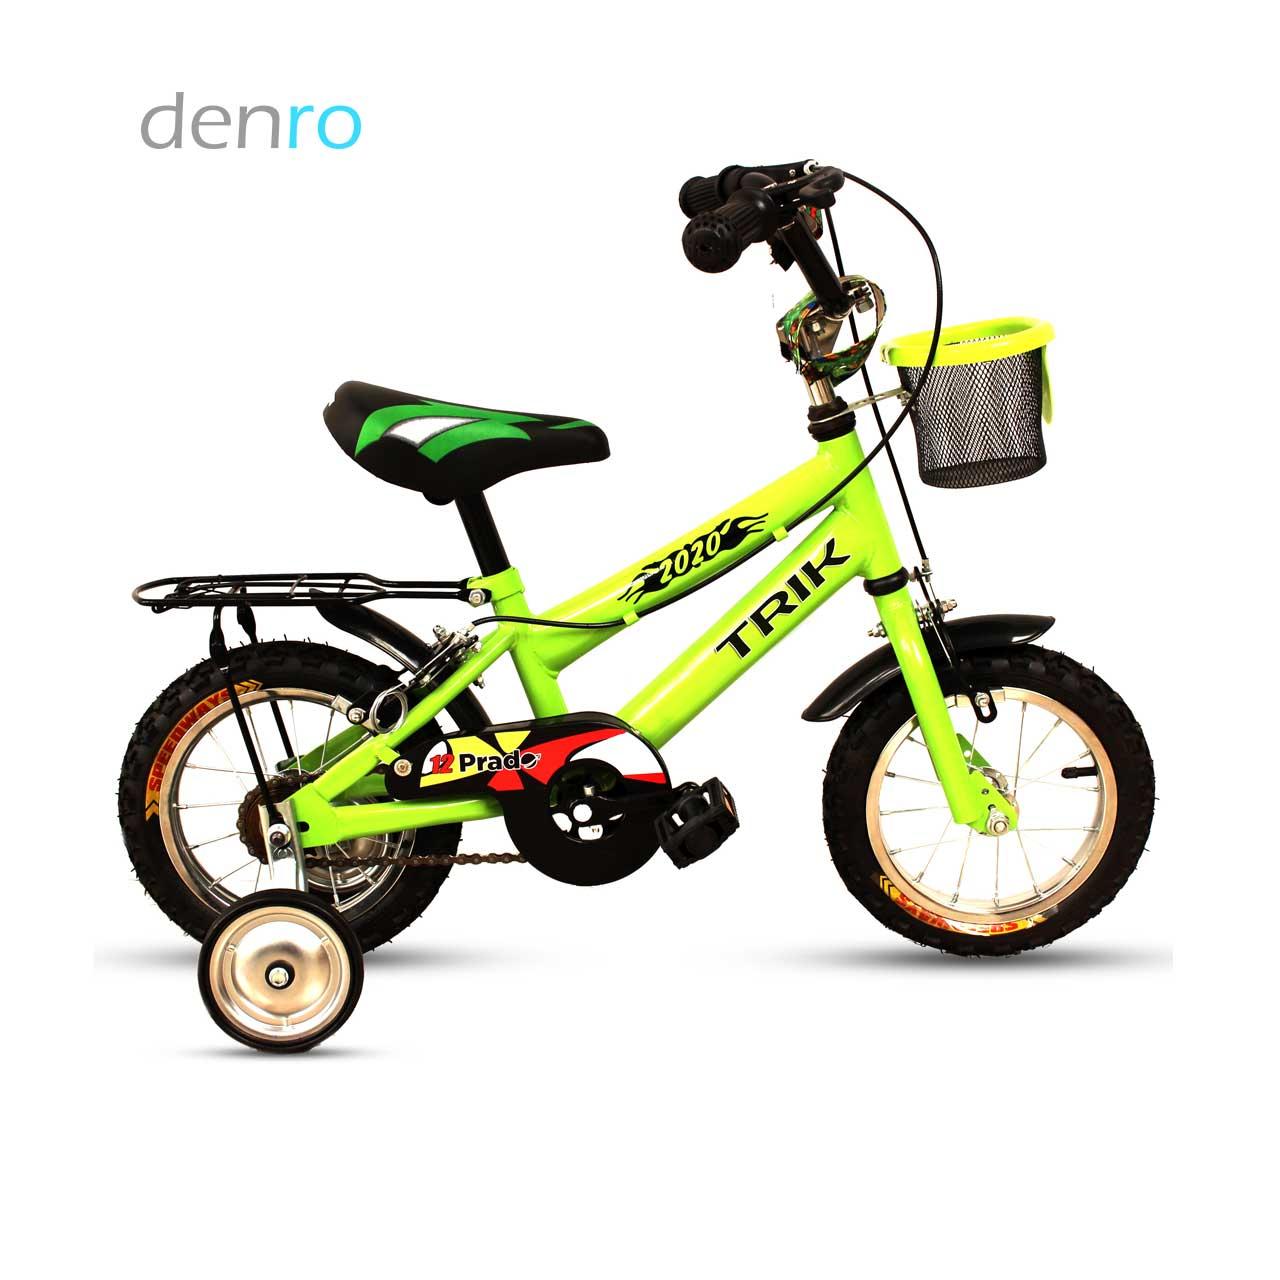 دوچرخه کودک دنرو مدل Sweet